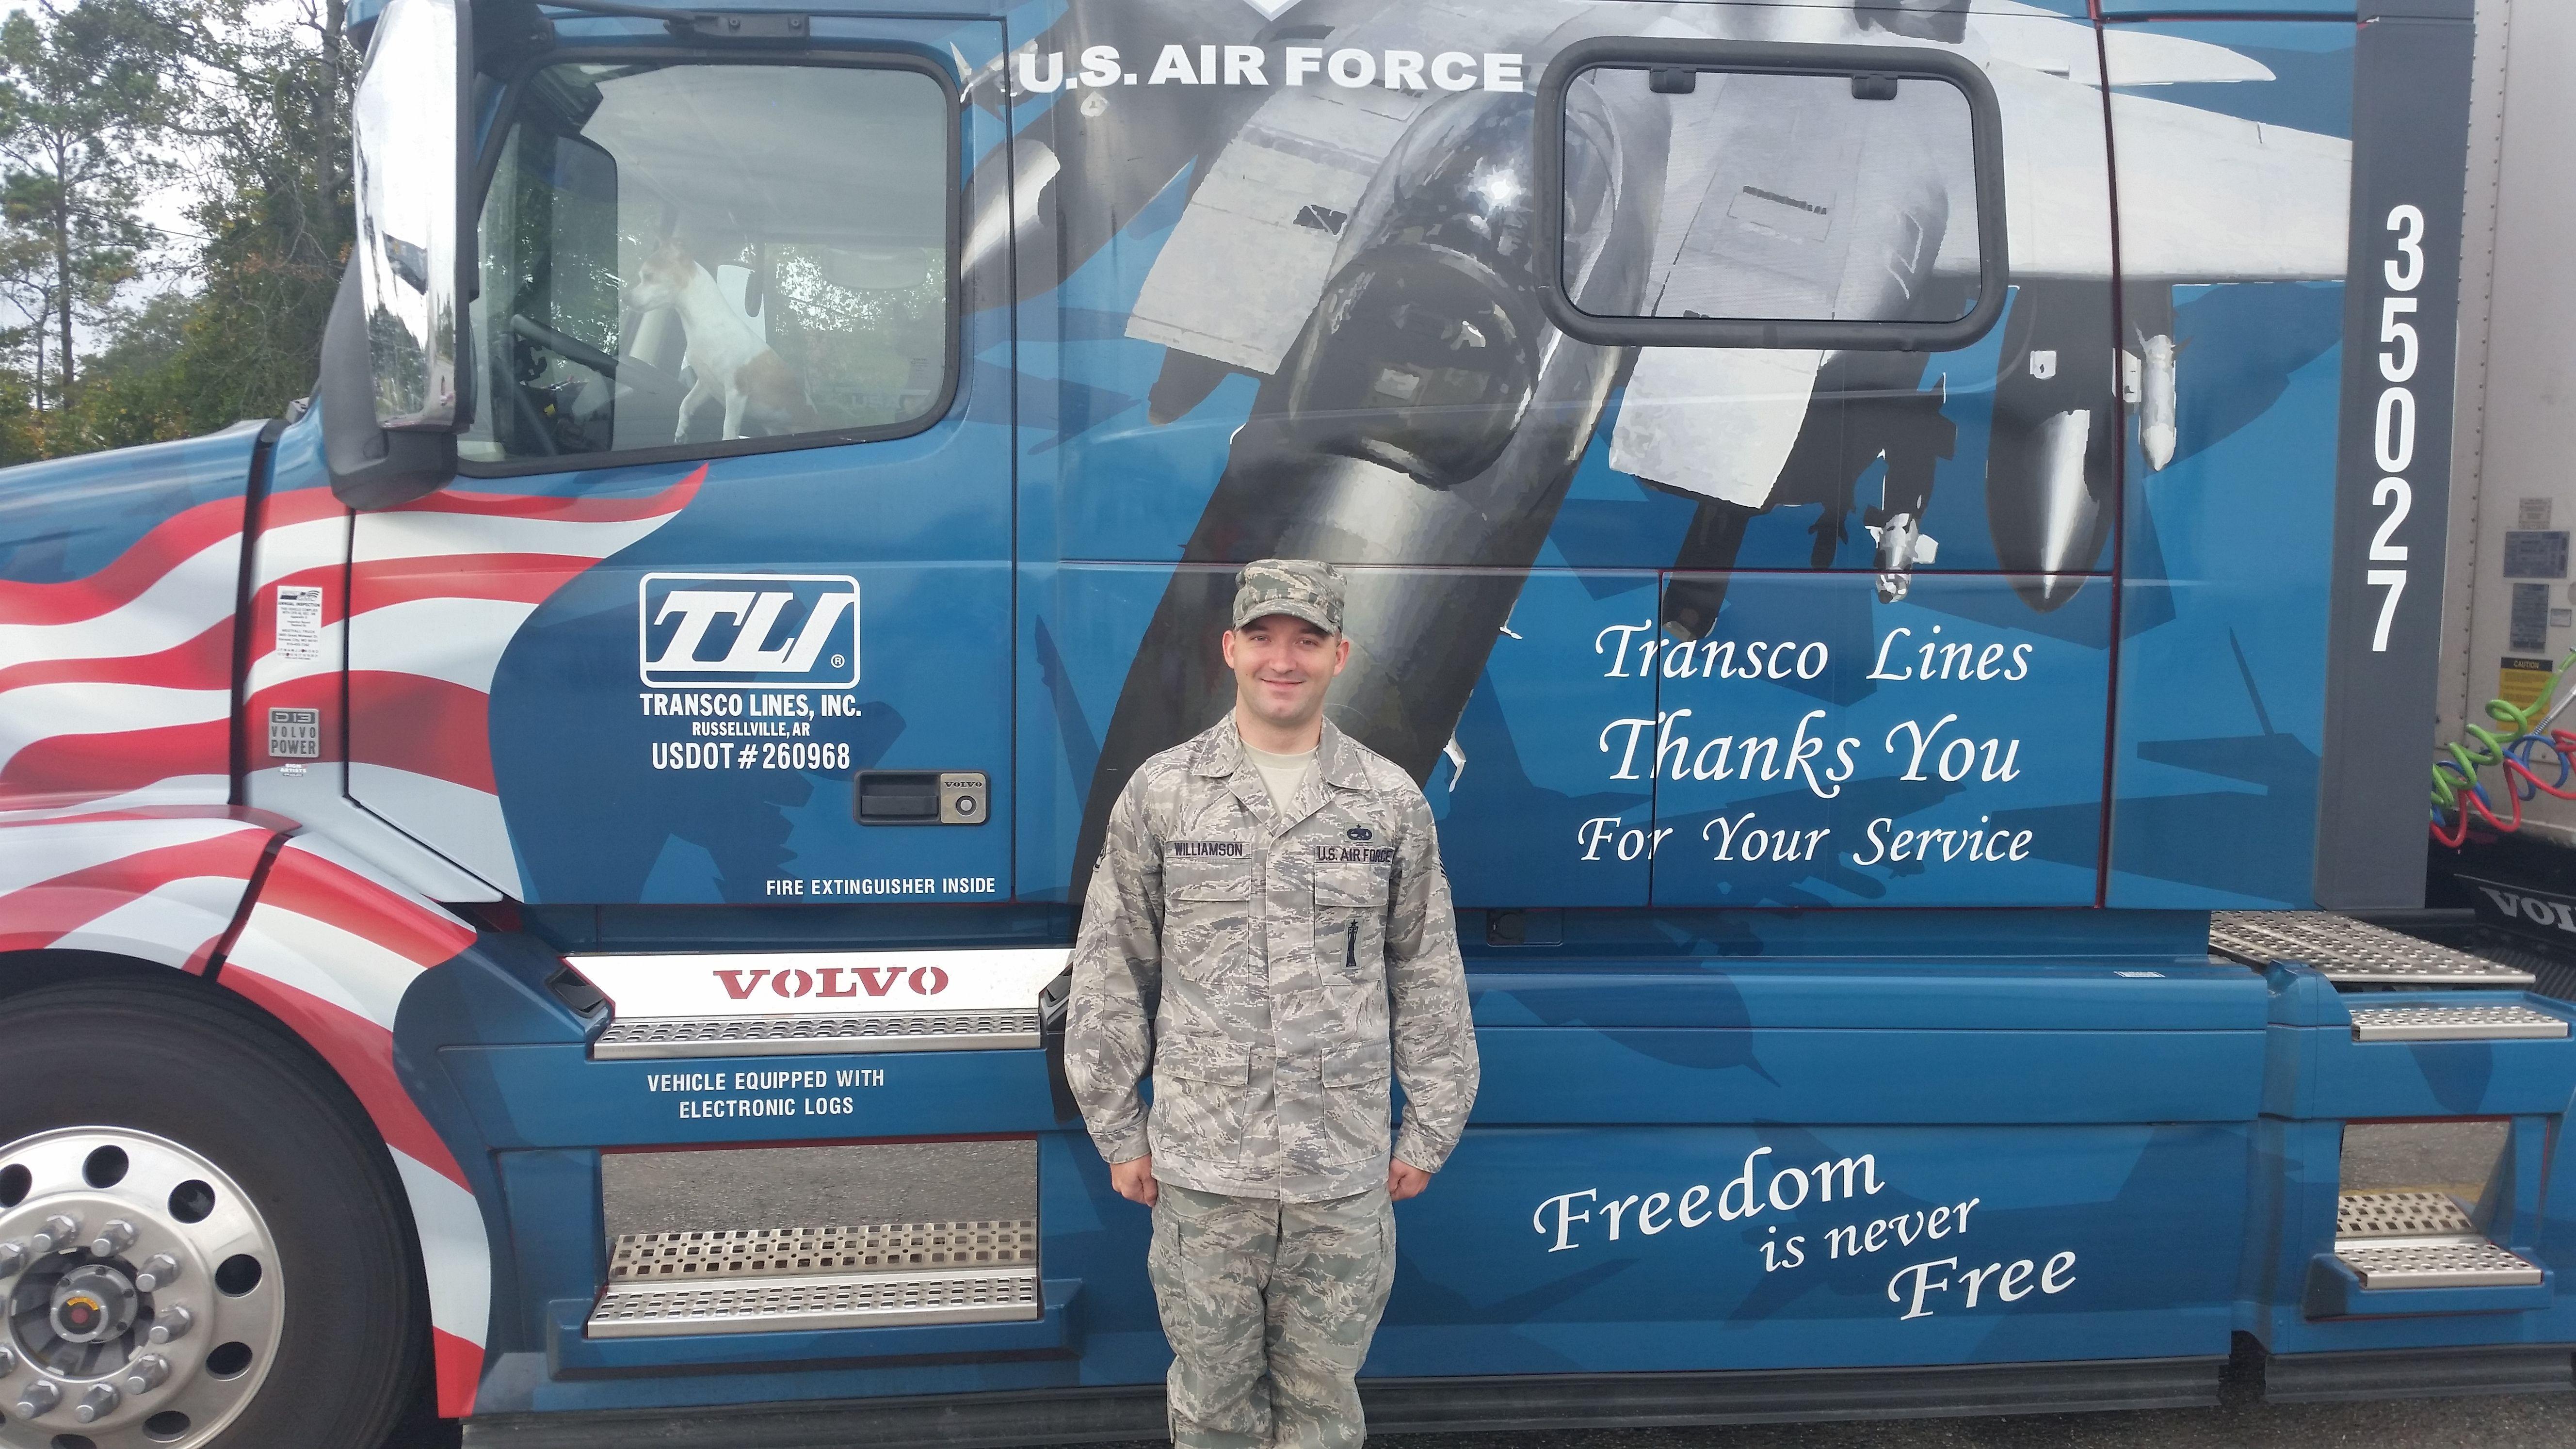 TLI Air Force Volvo truck honoring military veterans